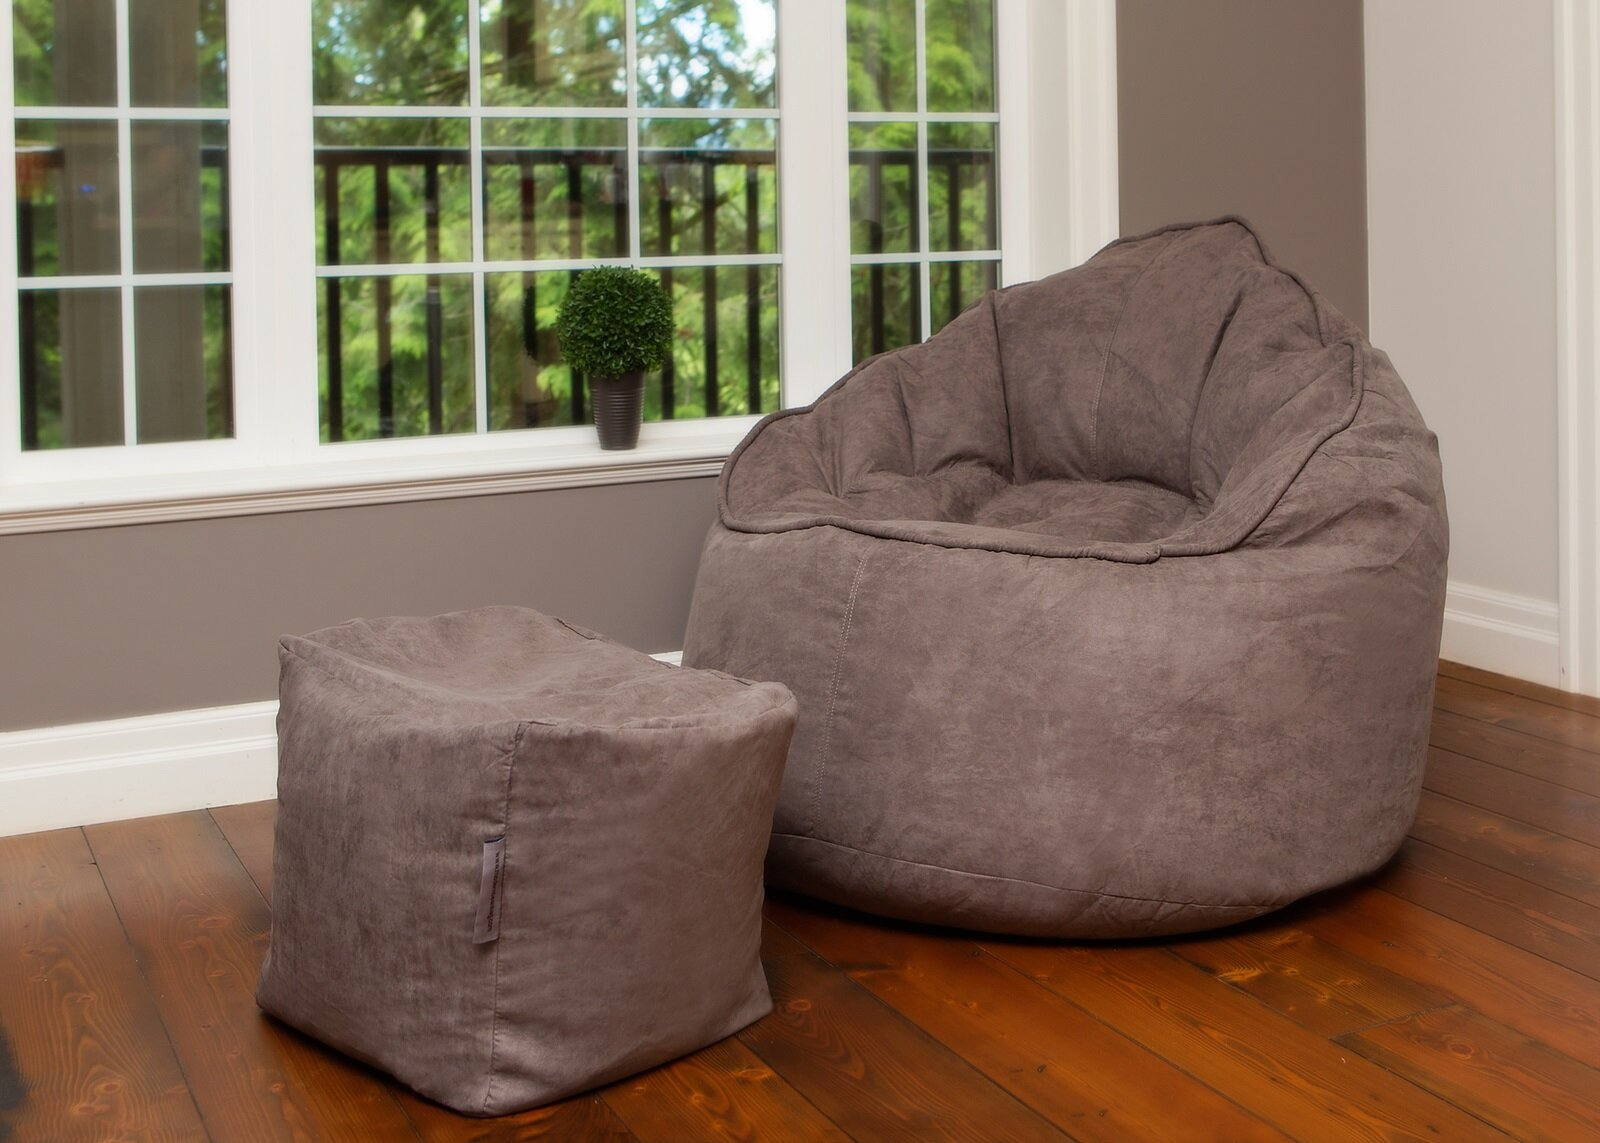 Astonishing The Giant Pod Adult Large Bean Bag Set Machost Co Dining Chair Design Ideas Machostcouk